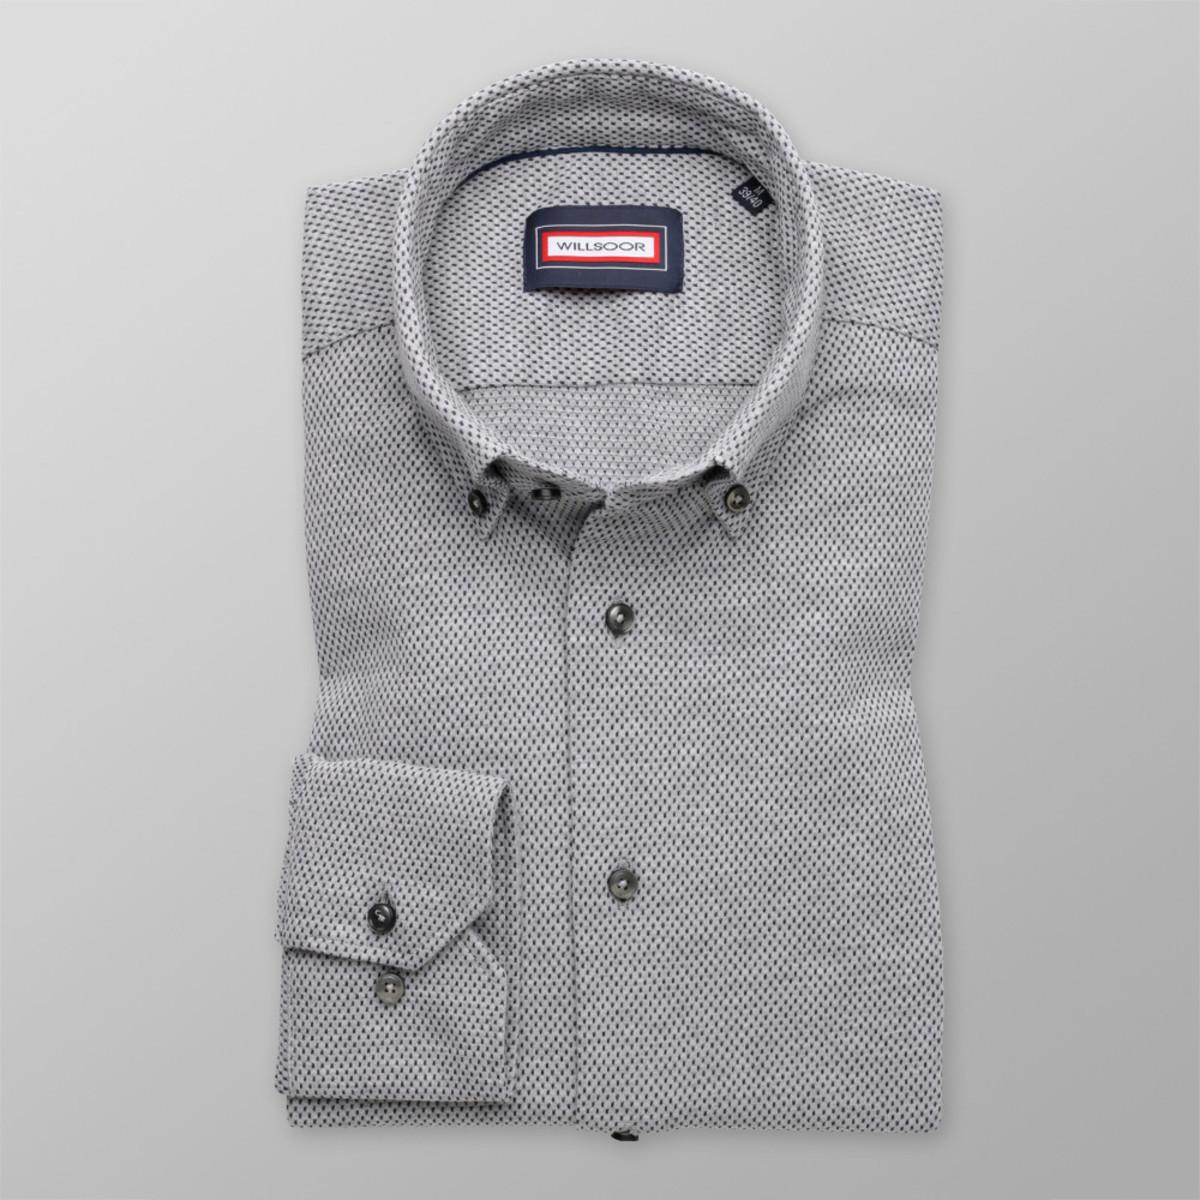 82fad4076ca Košile Classic (výška 176-182 i 188-194) 8900 - Willsoor